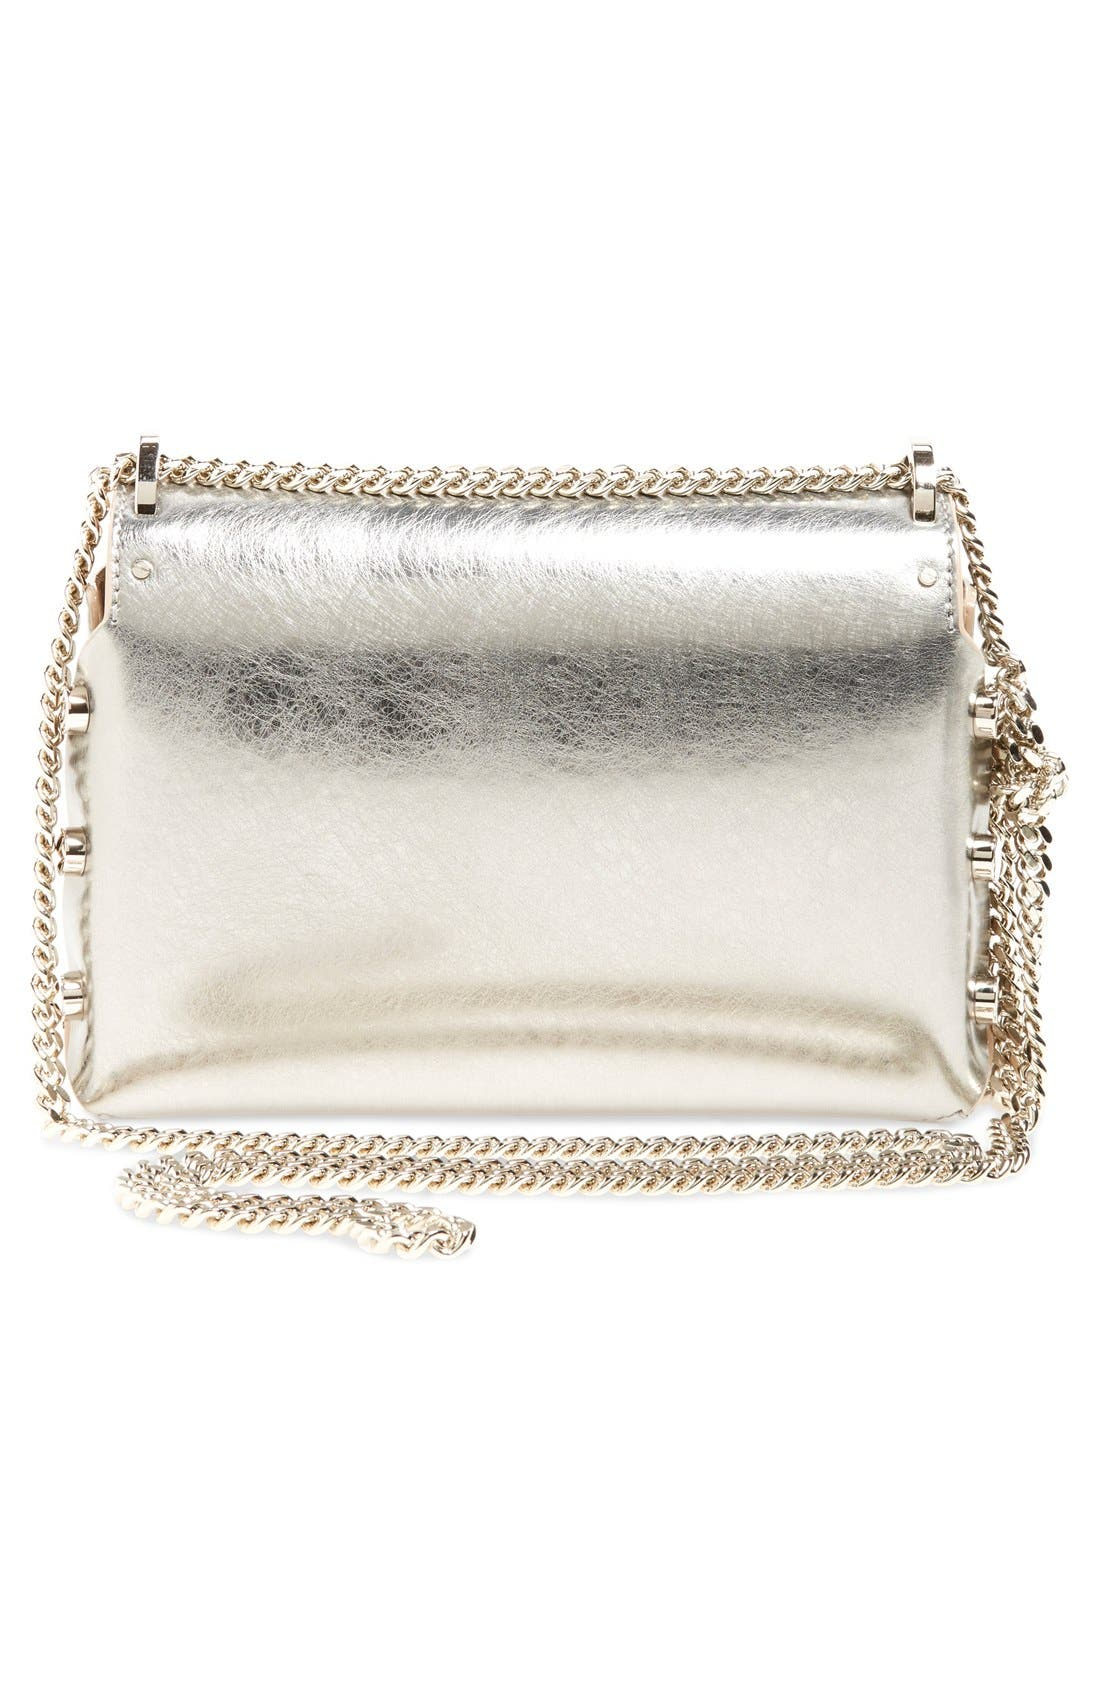 'Lockett Petite' Metallic Leather Shoulder Bag,                             Alternate thumbnail 6, color,